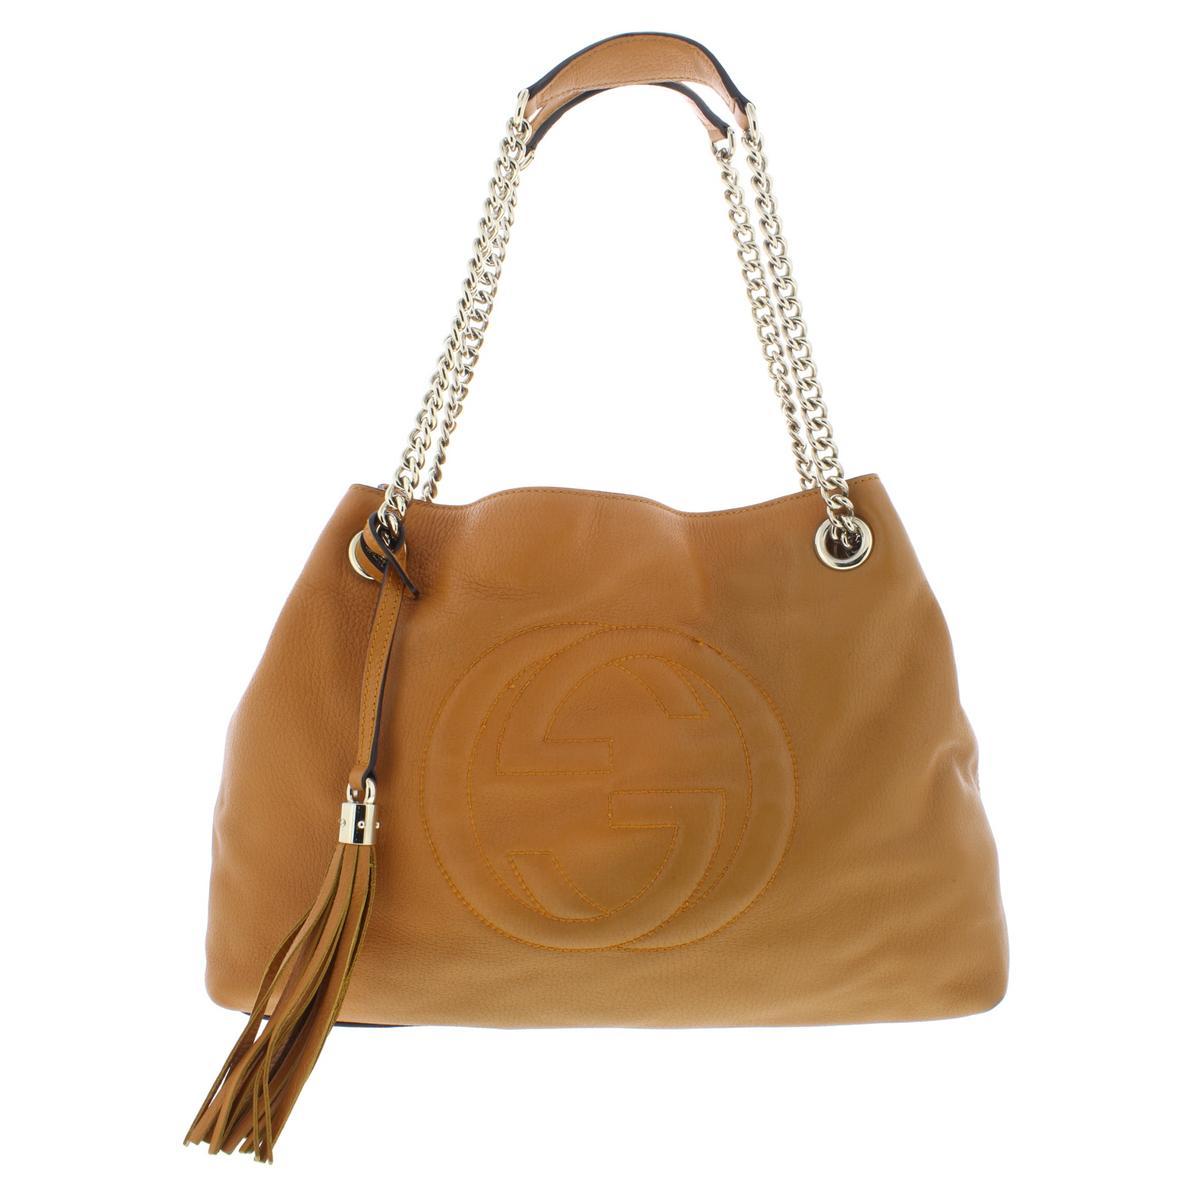 4de22824f8b8df Details about Gucci Womens Soho Tan Leather Tote Shoulder Handbag Purse  Large BHFO 5969